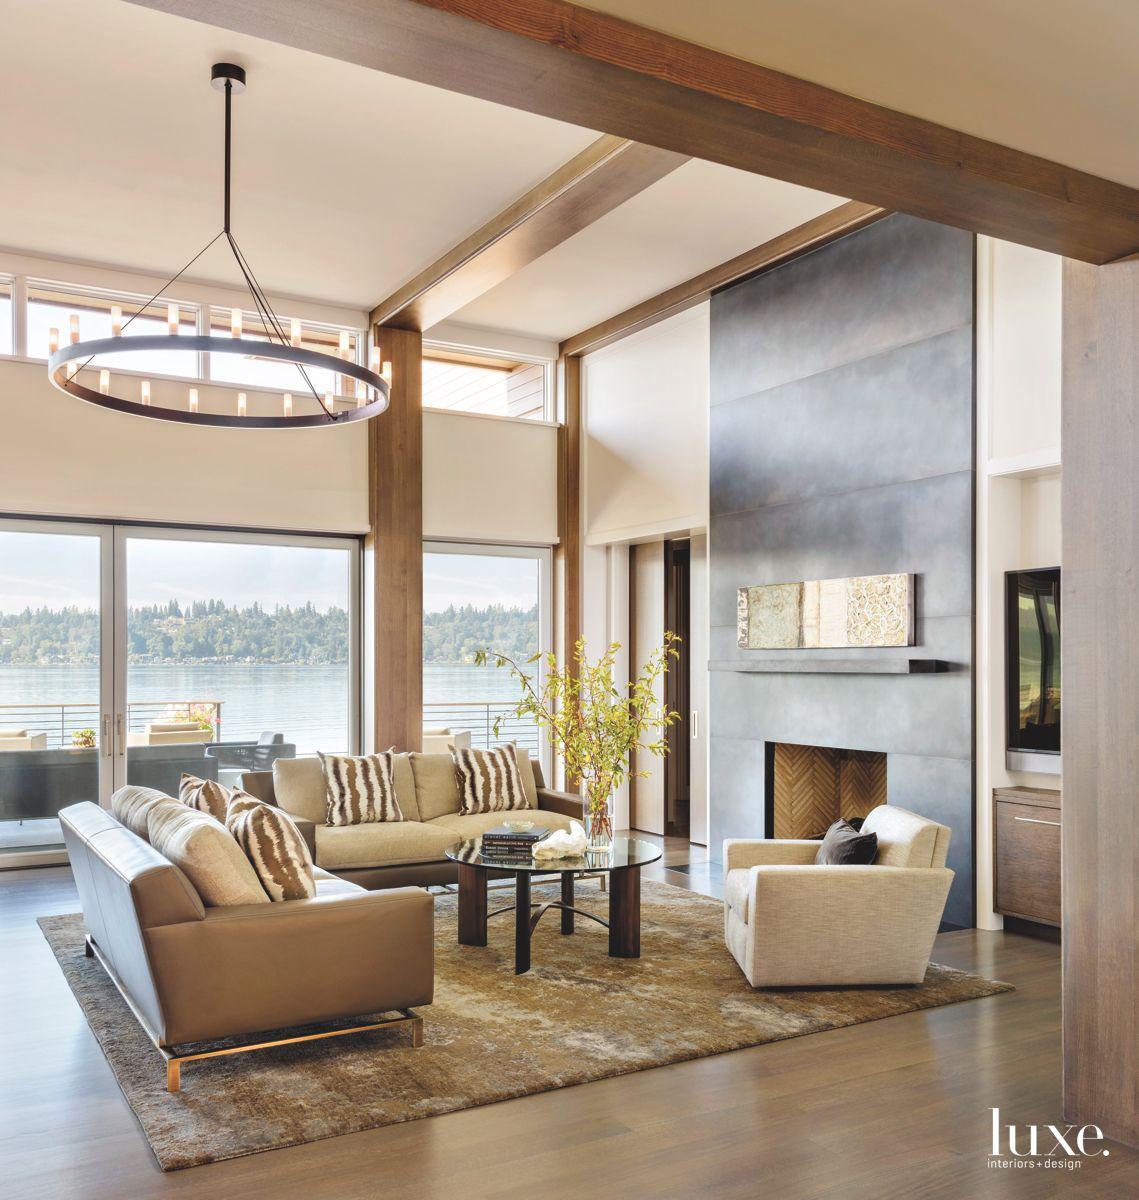 Chevron Herringbone Interior Fireplace Living Room with Zebra Stripe Pillow with Water Views